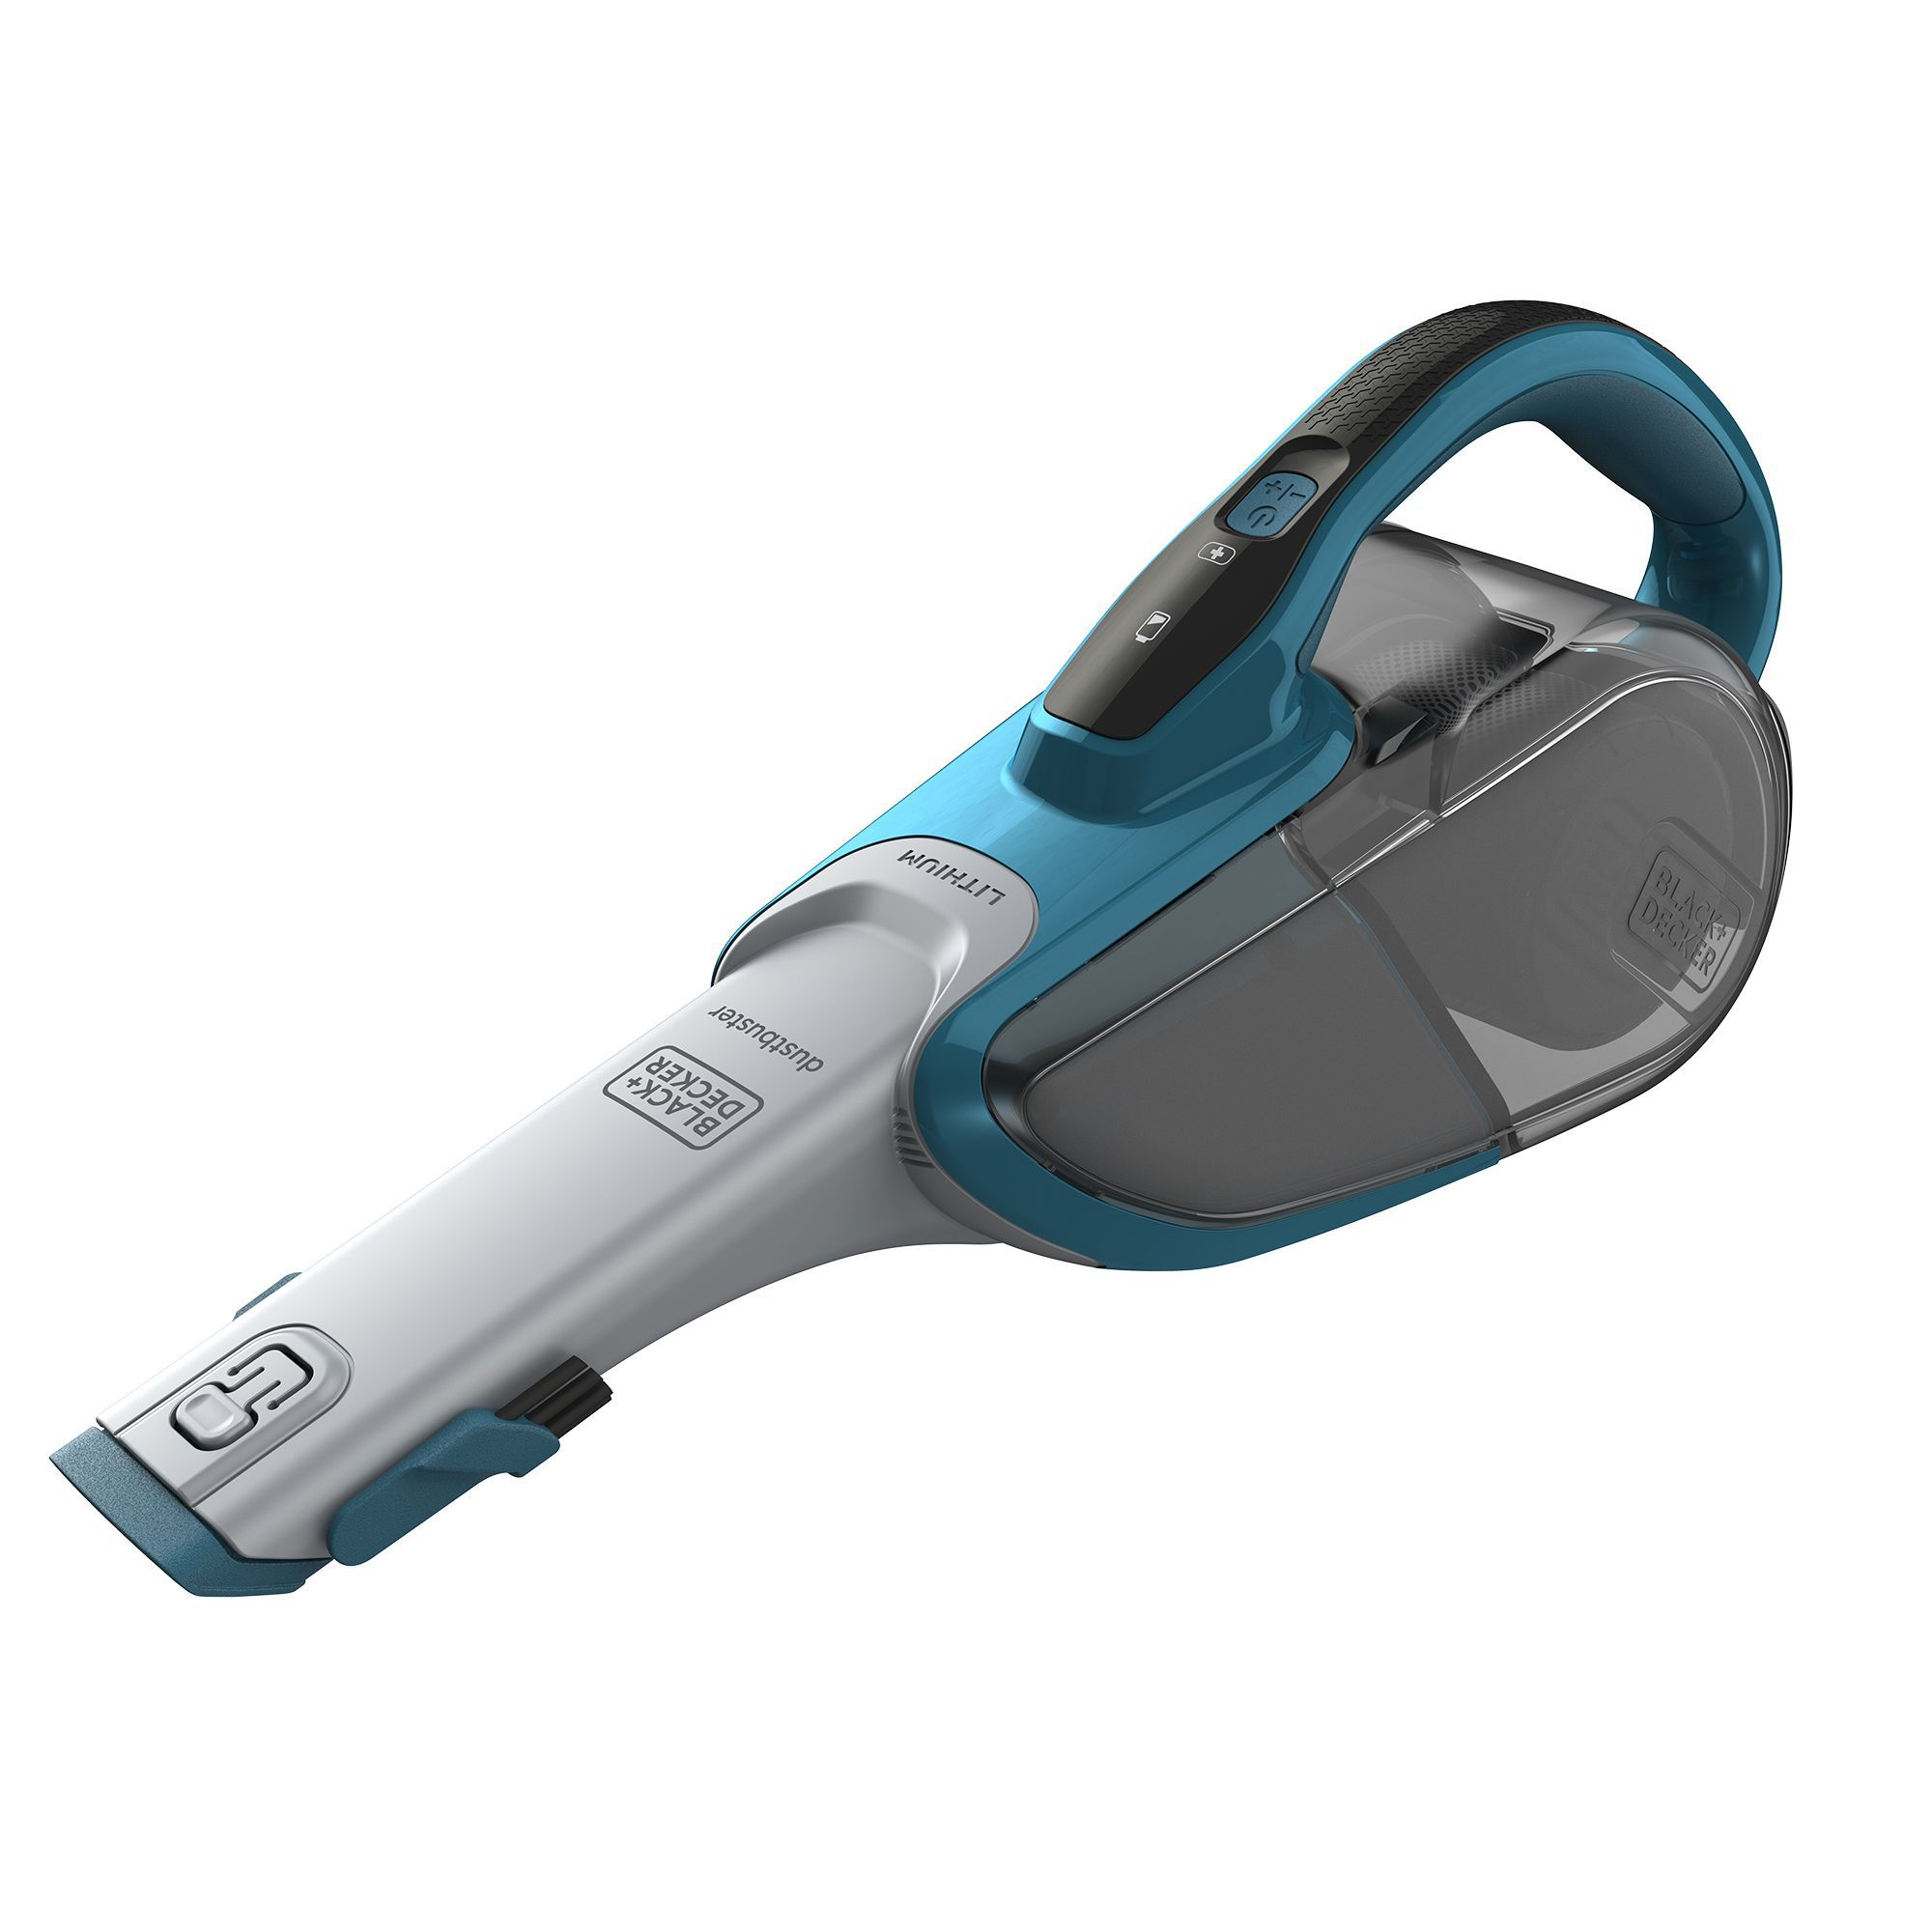 Black & Decker Dust Buster Cordless Handheld Vacuum Cleaner Dvj320j-gb